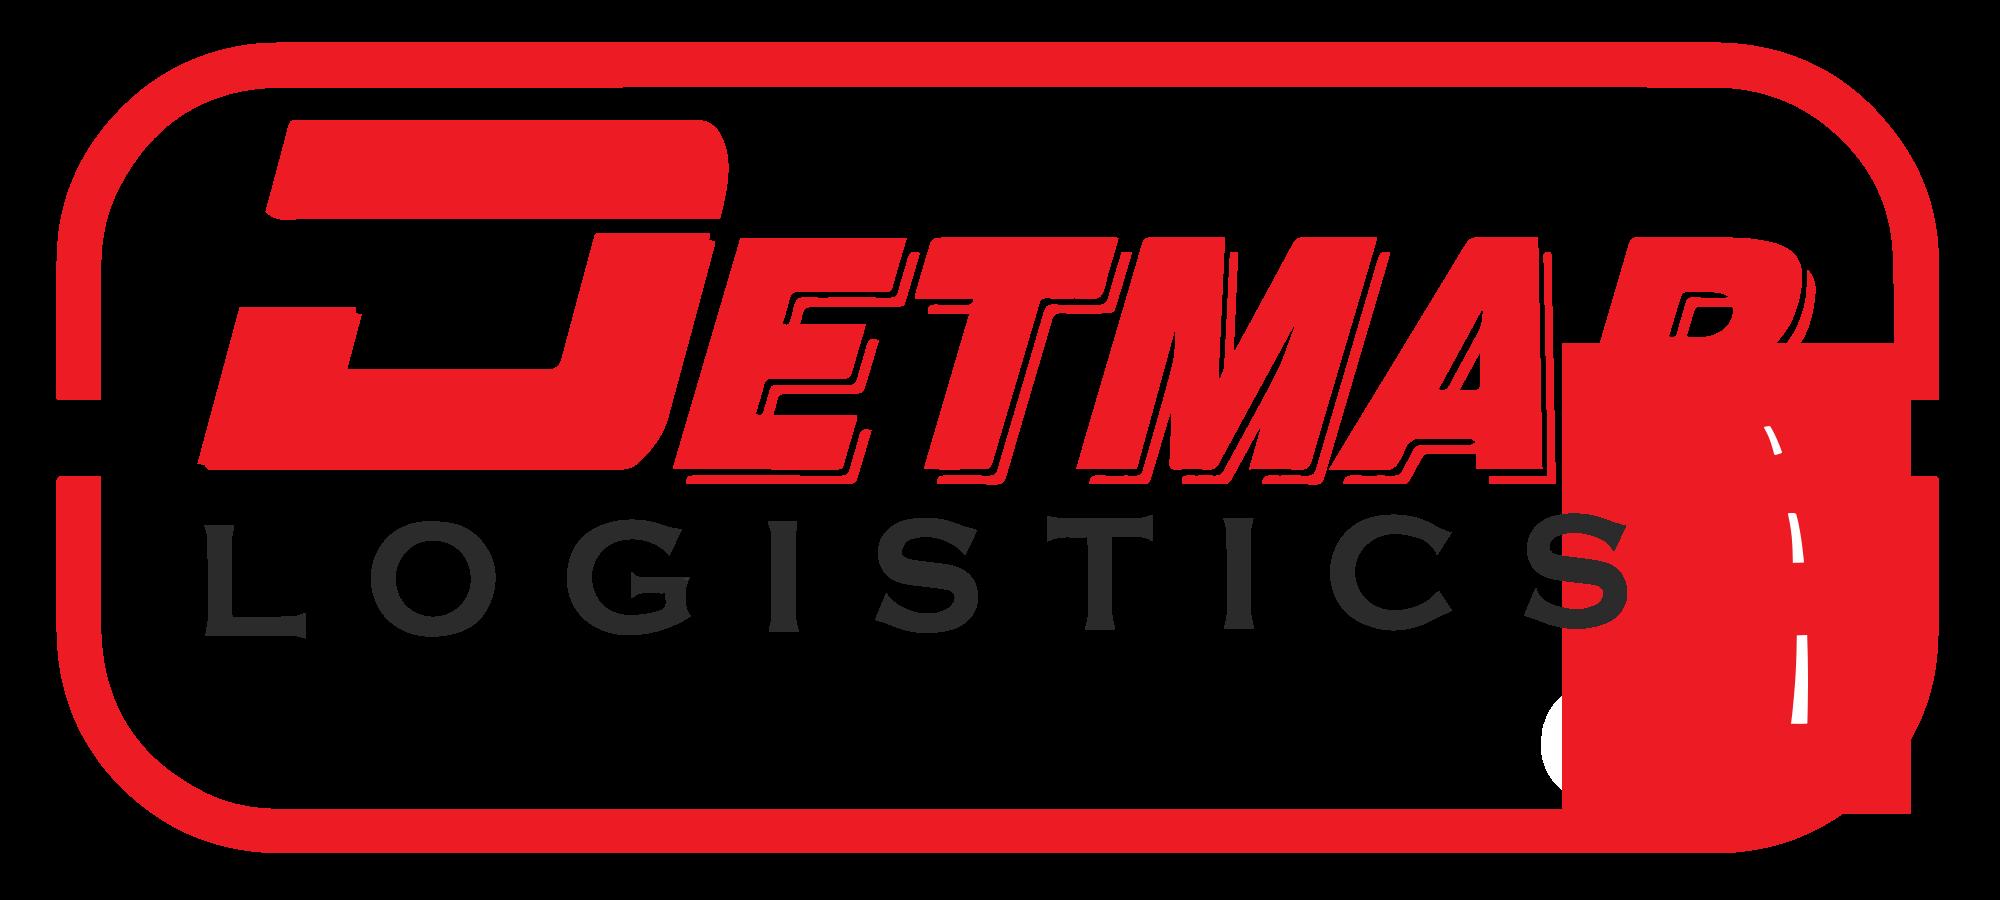 detmar-logo-123